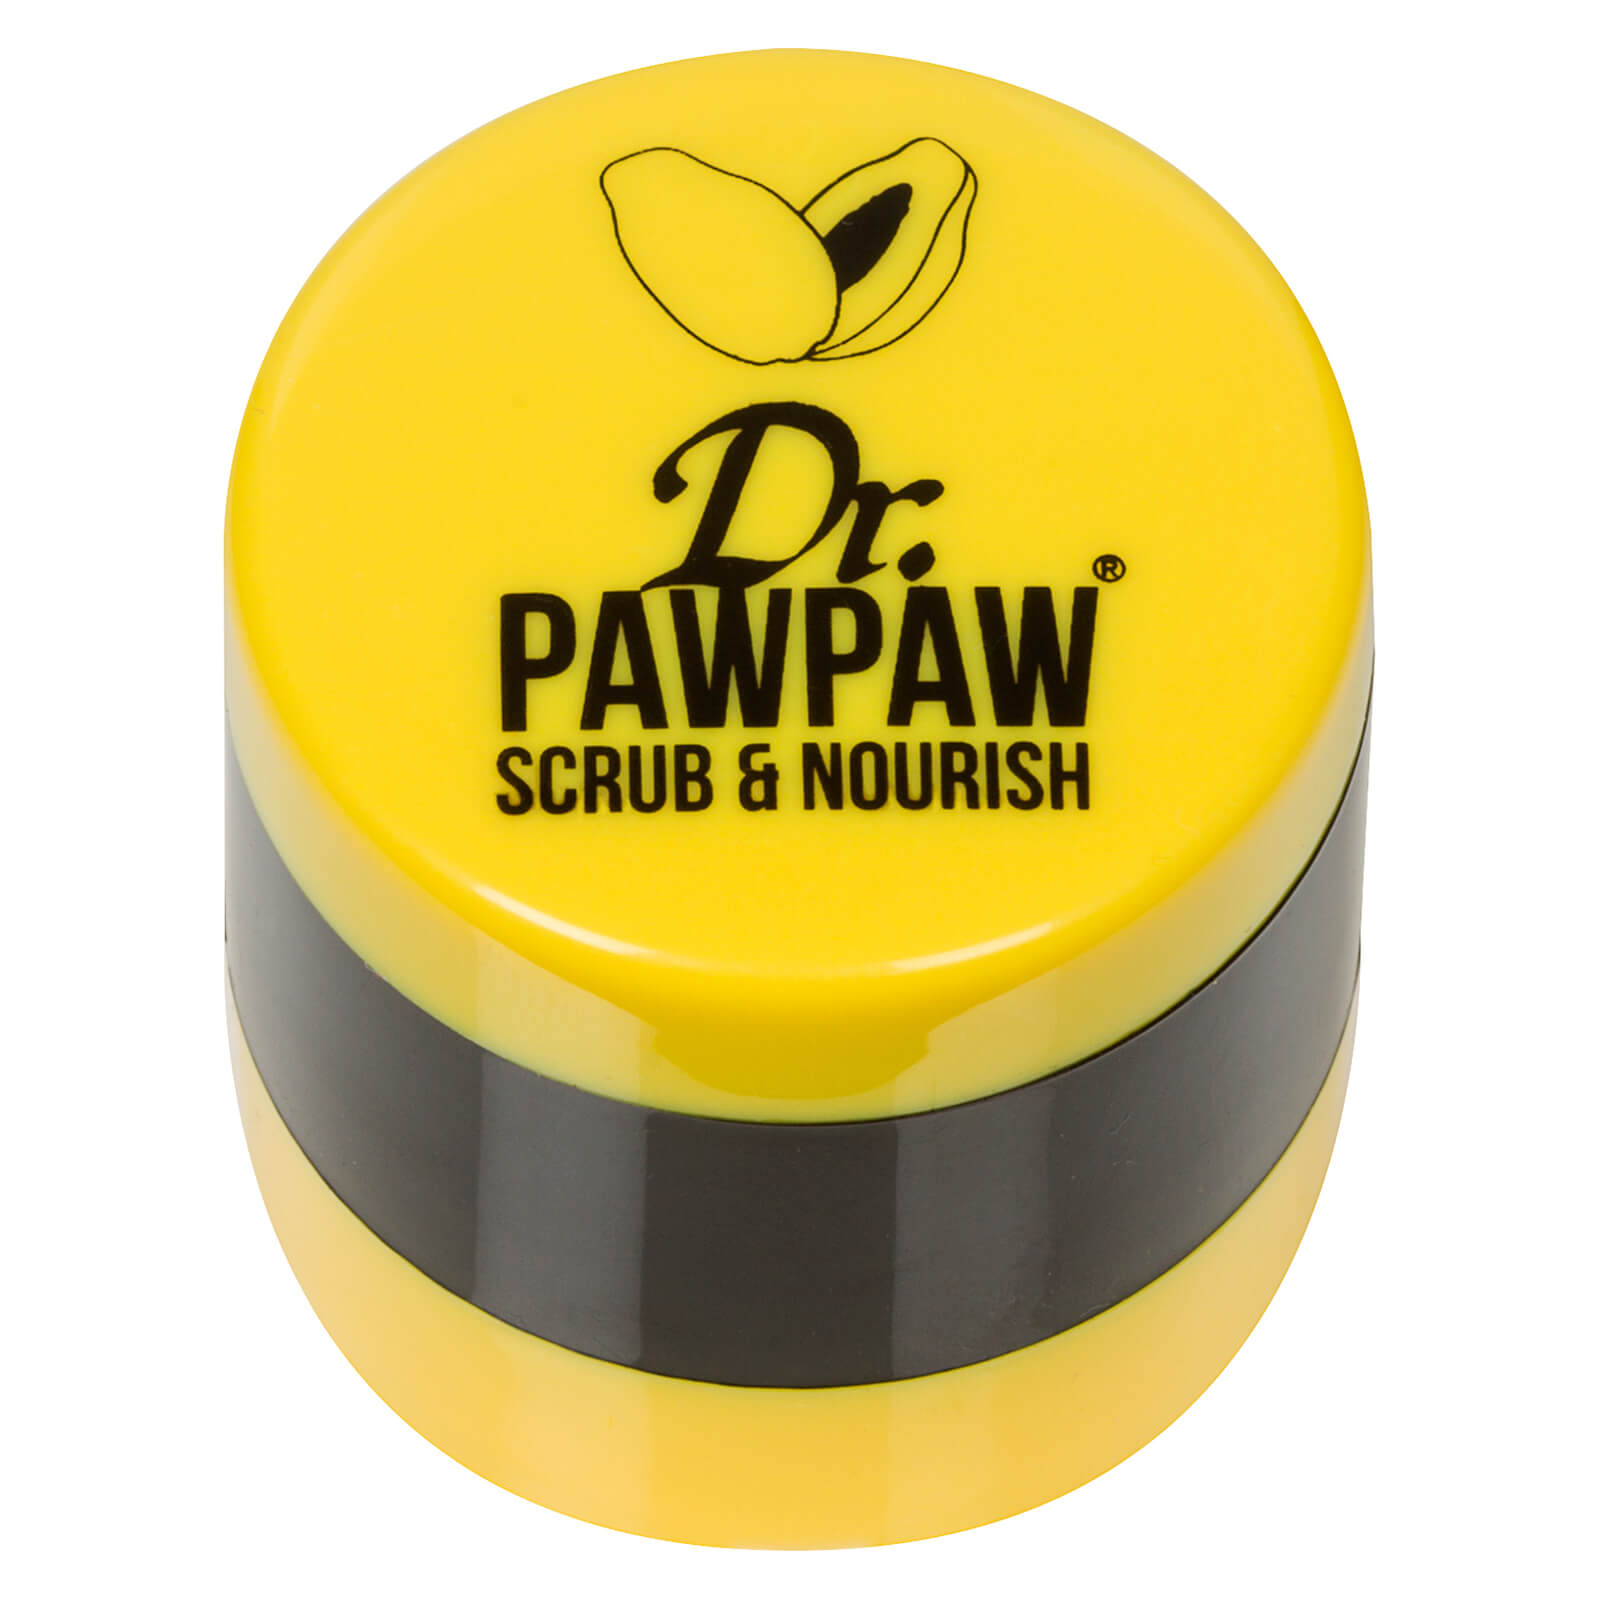 null - Dr. PAWPAW Scrub & Nourish